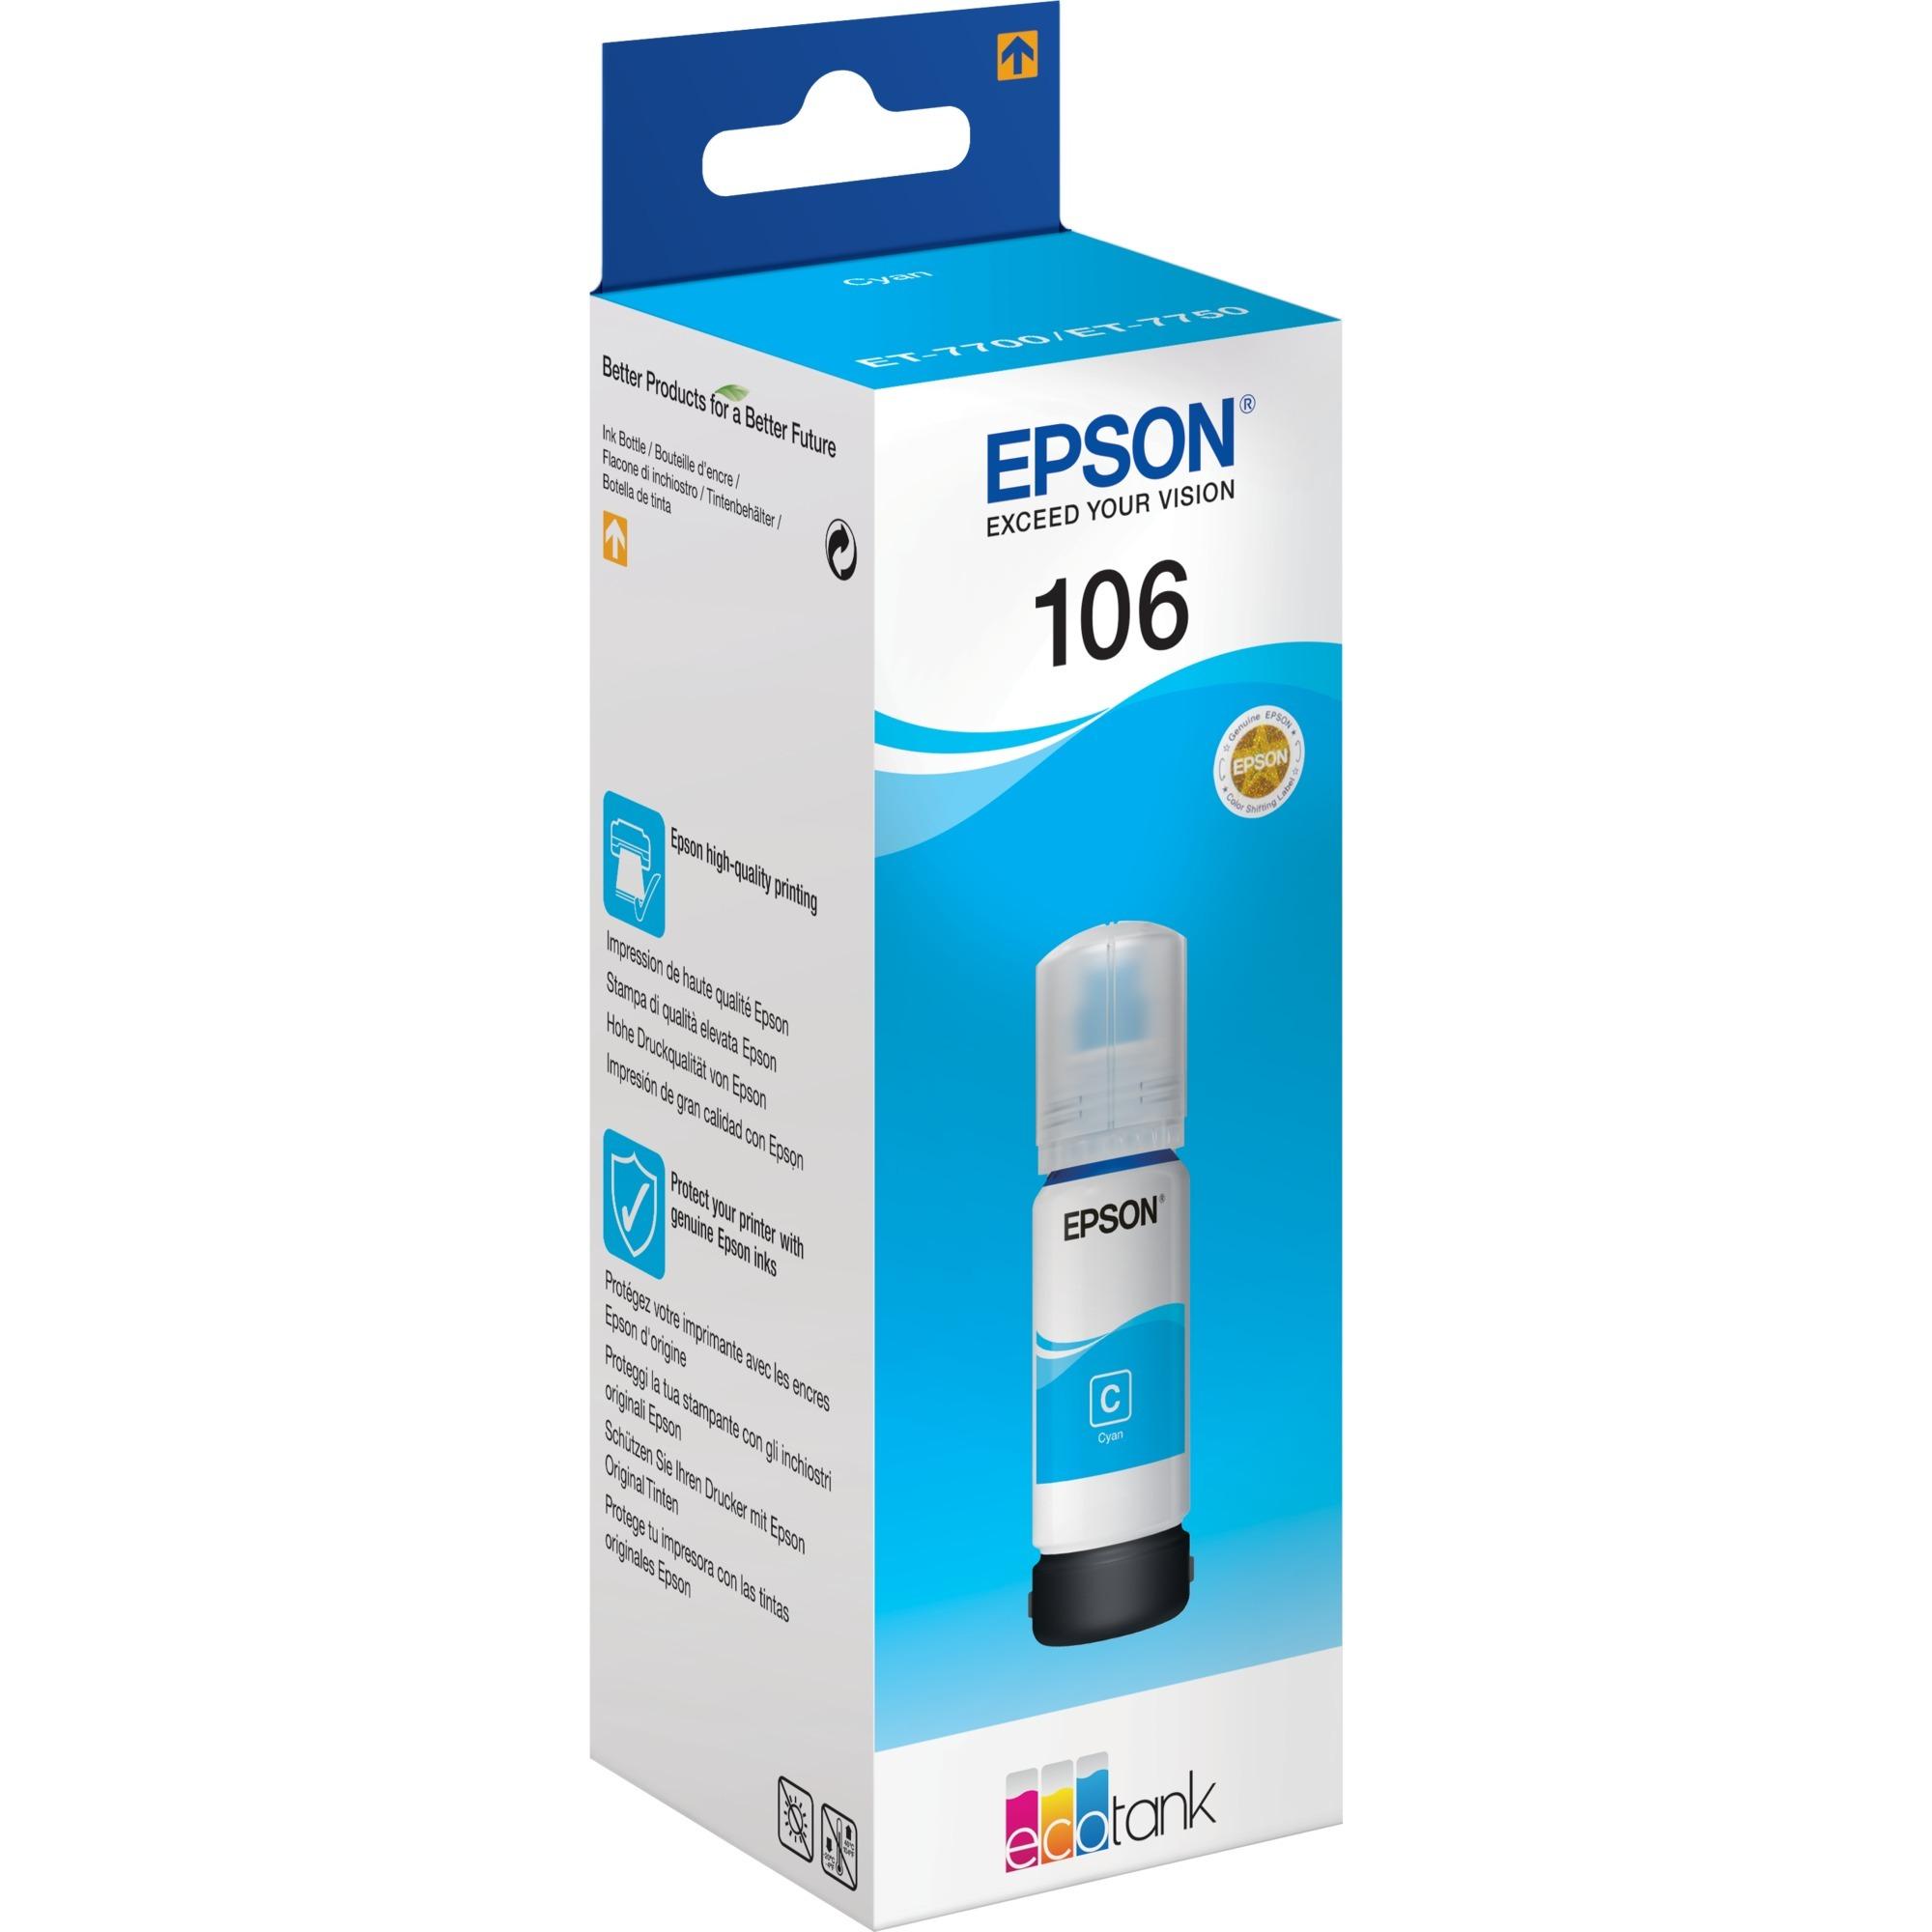 106 EcoTank Cyan ink bottle cartucho de tinta